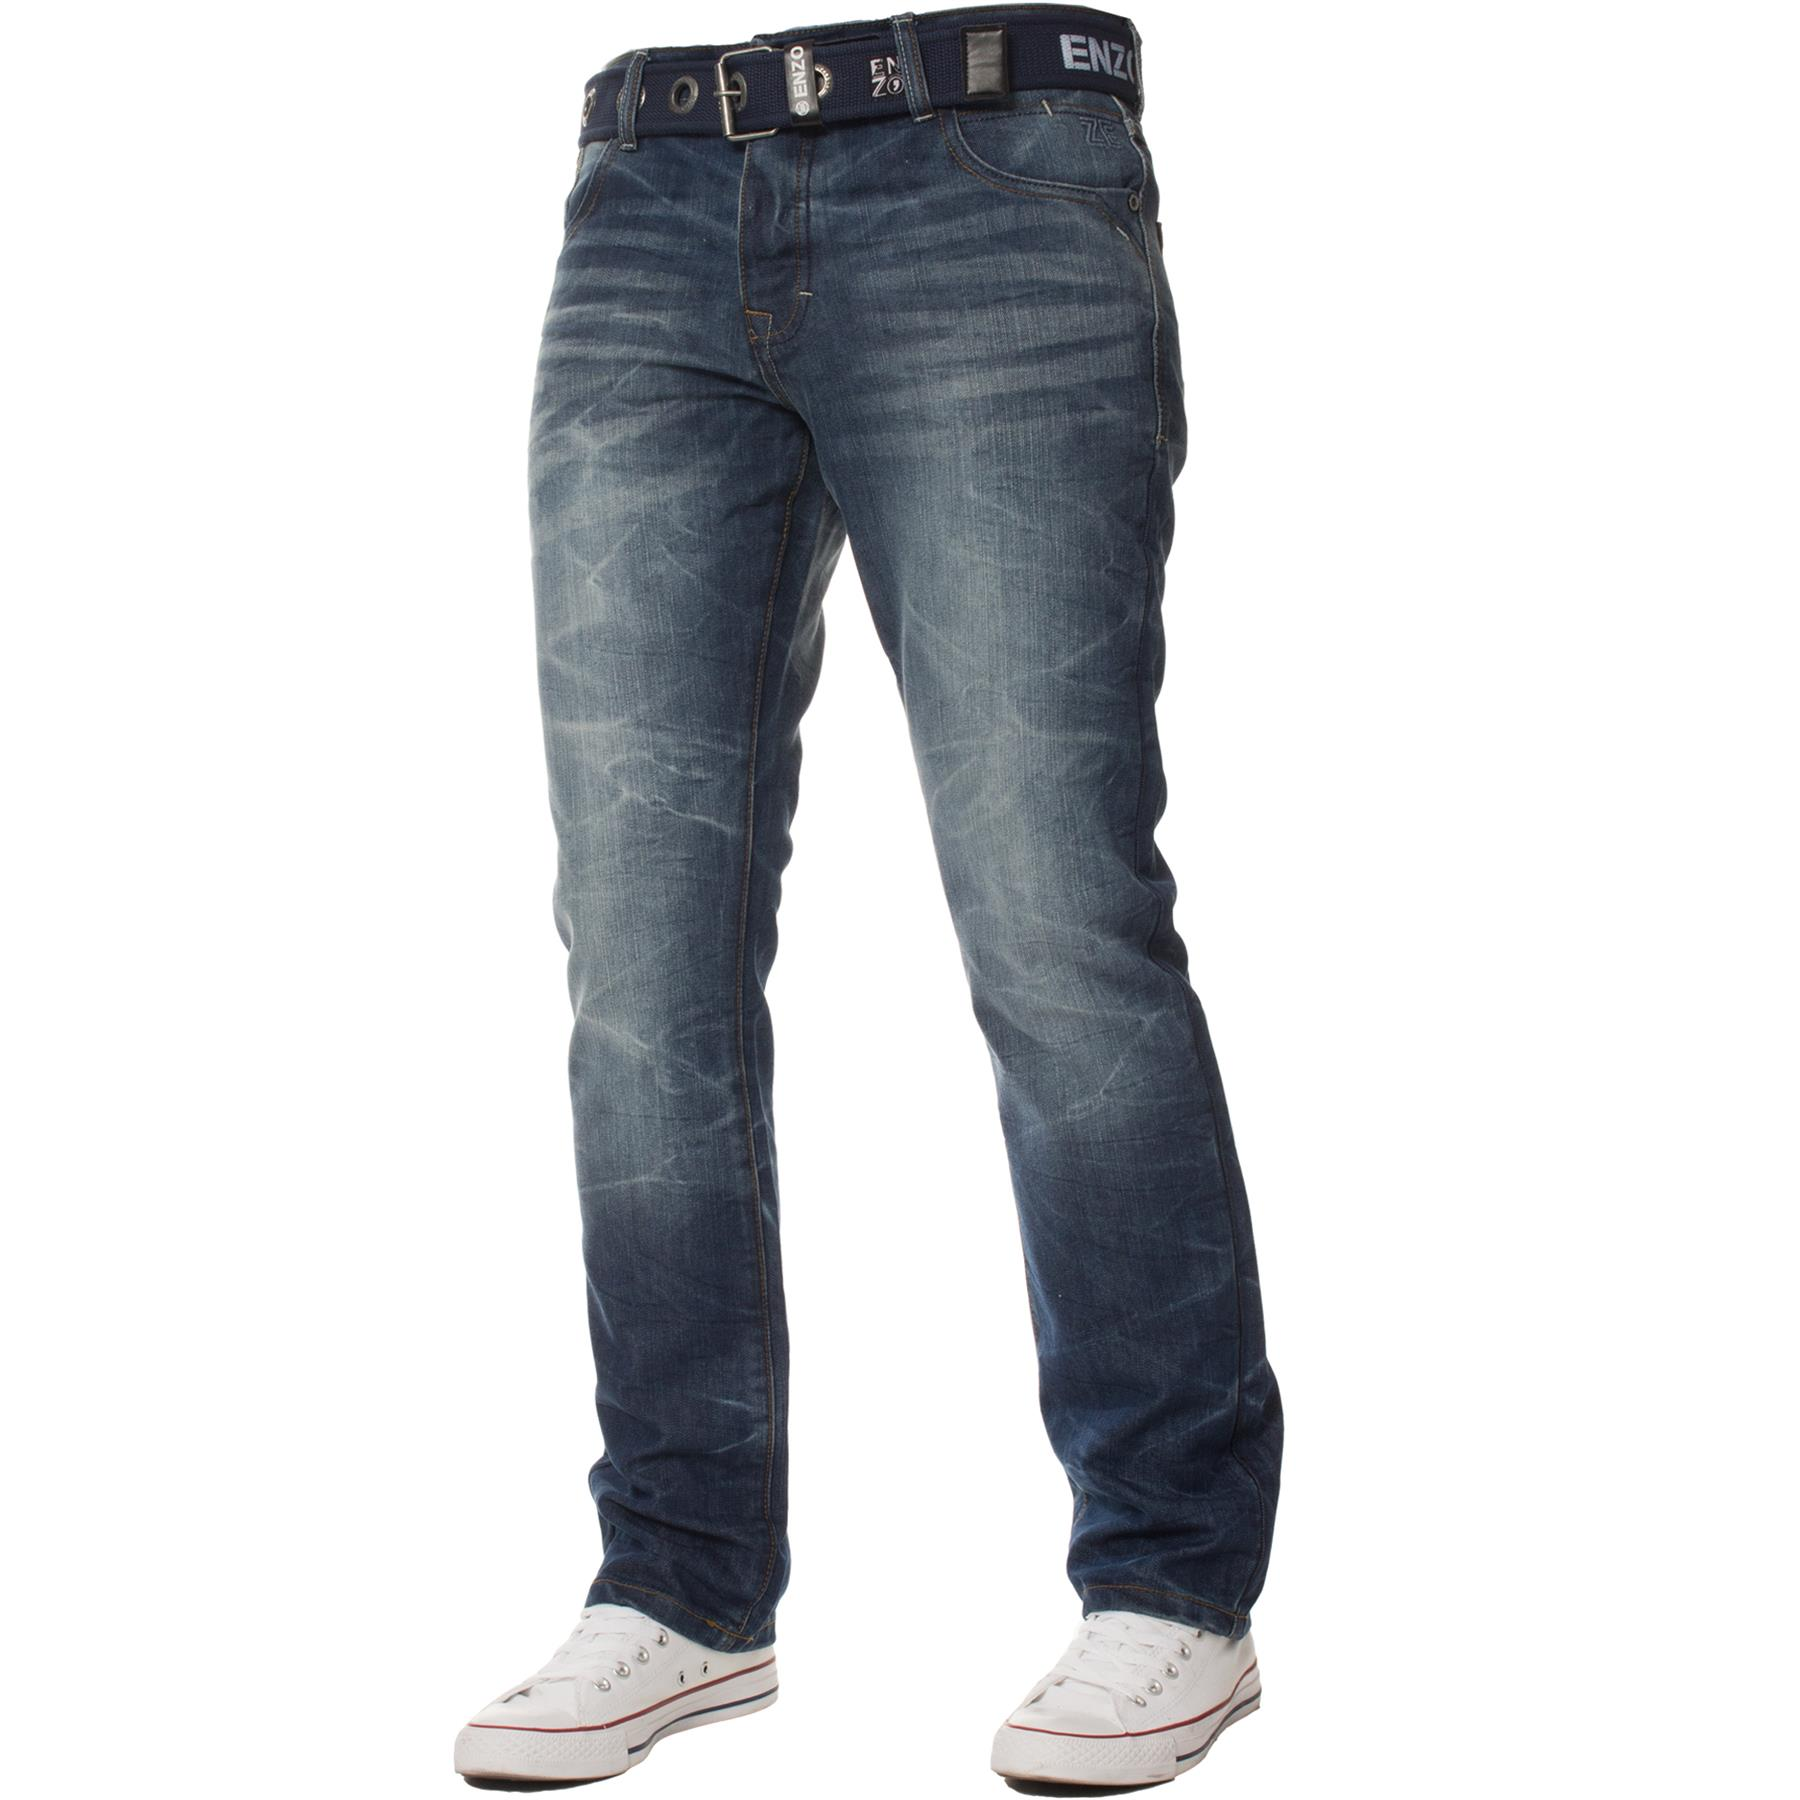 ENZO-Jeans-para-hombre-Big-Alto-Pierna-King-Size-Jeans-Pantalones-Chino-Pantalones-Pantalones-44-034 miniatura 84